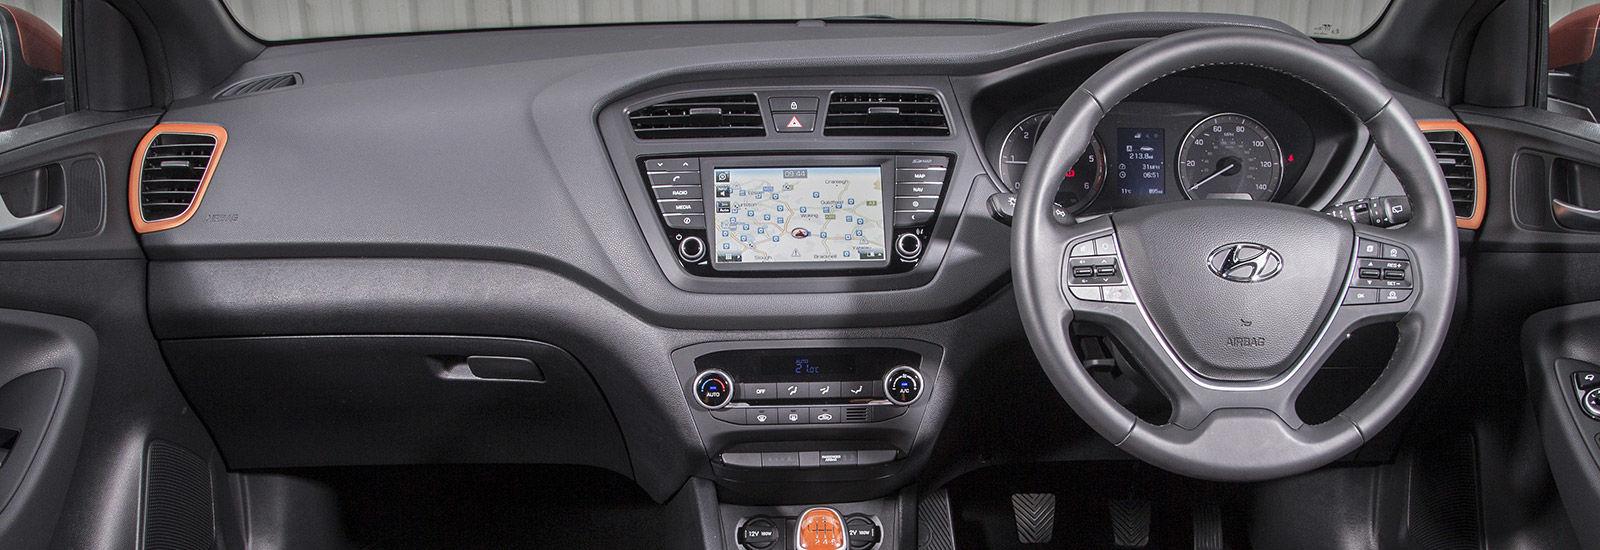 Hyundai I20 Interior Dimensions